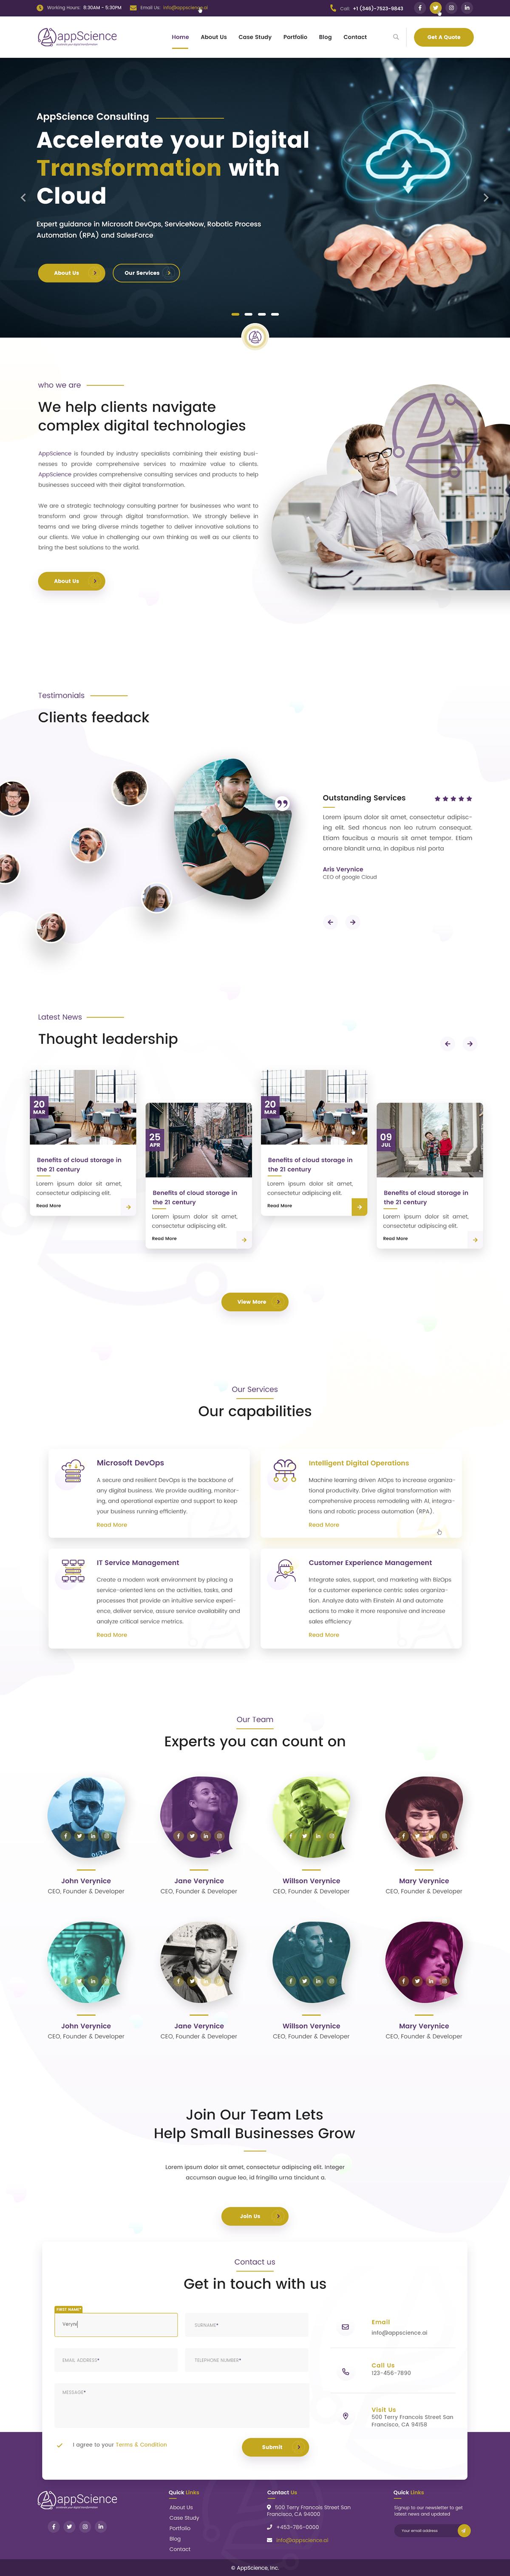 Consulting Cloud Consulting corporate website Modern Design clean website design minimalist modern simple Website Agency website